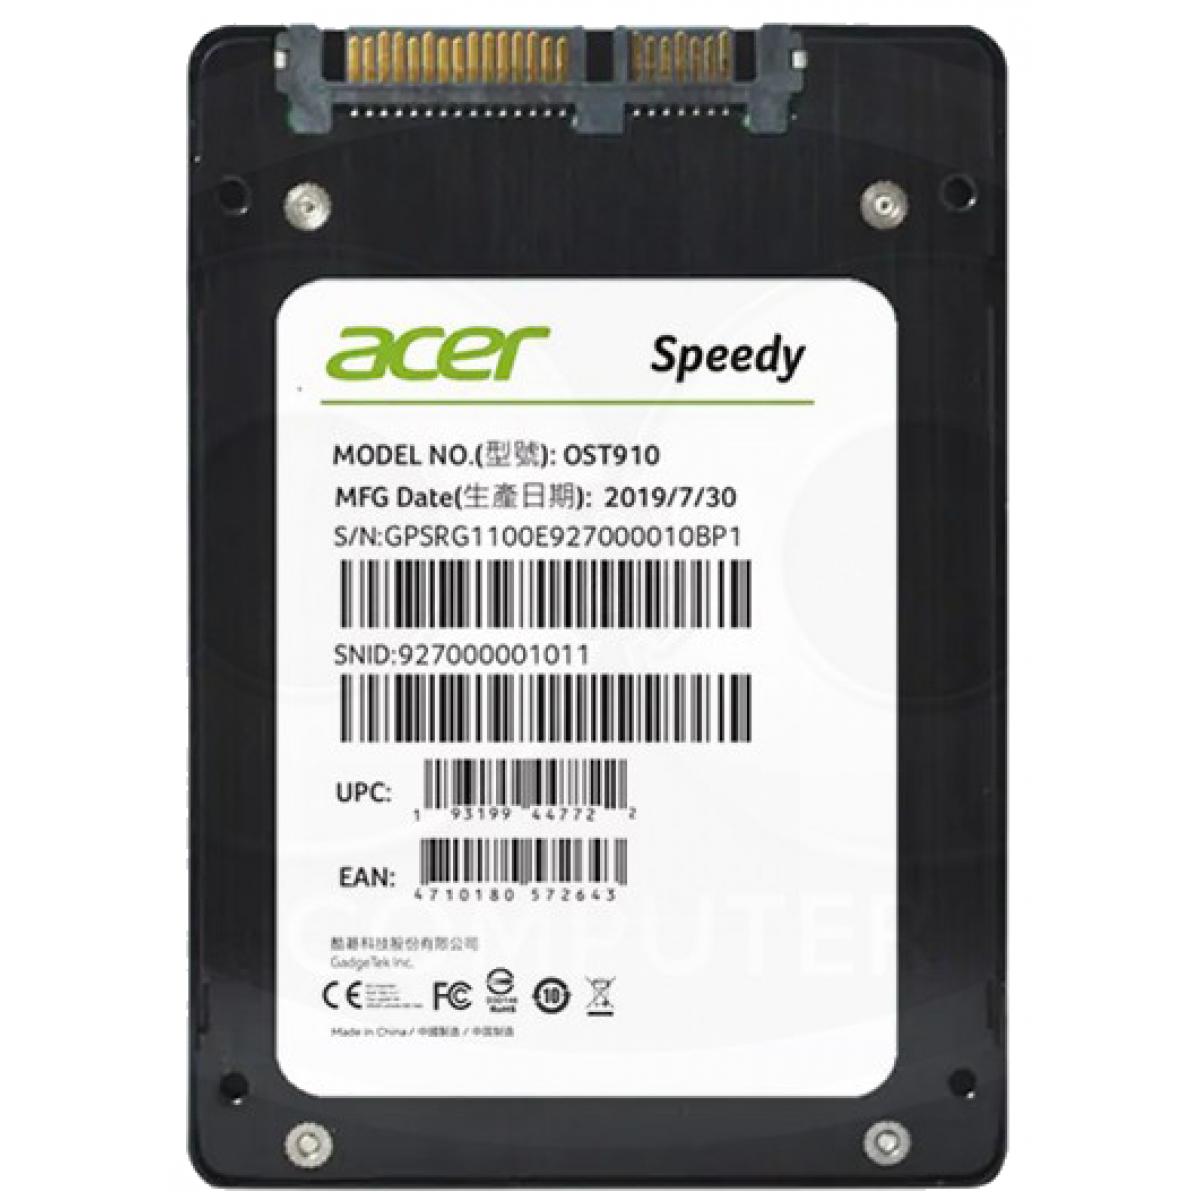 SSD Acer, Speedy, 240GB, SATA III, 550MB/s leitura, 490MB/s gravação, GP.SRG11.00F